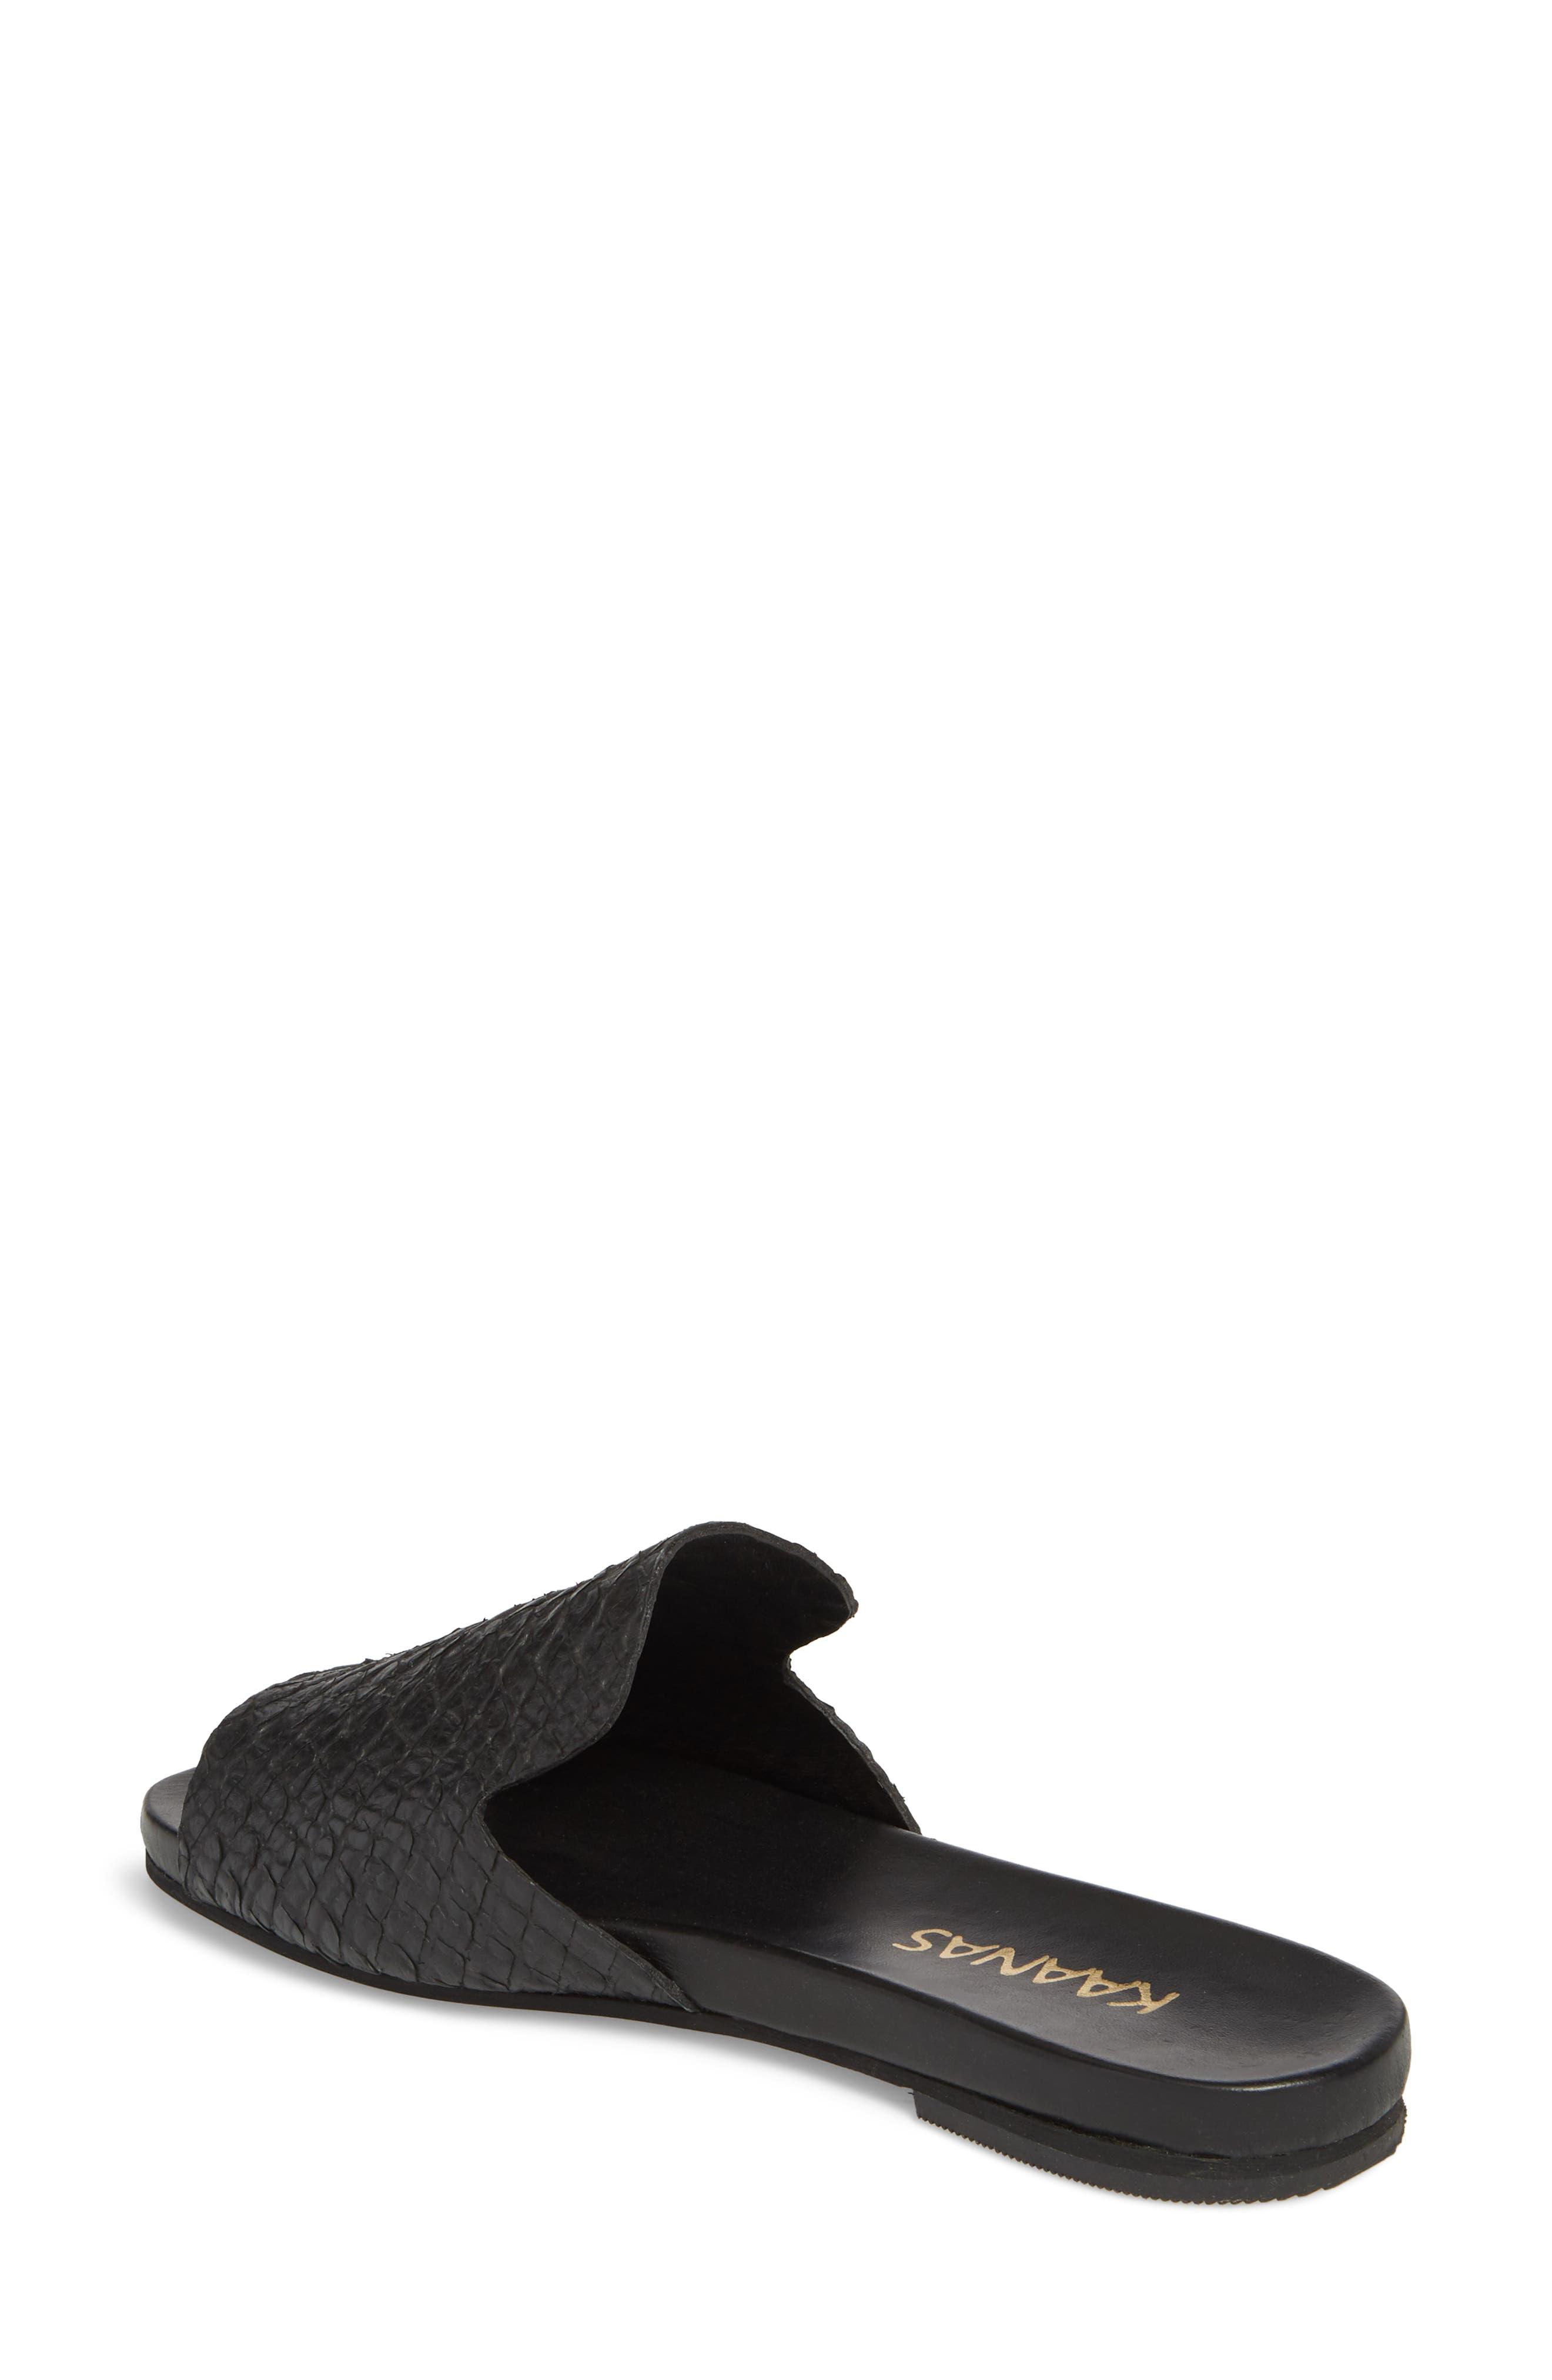 Leticia Loafer Mule Sandal,                             Alternate thumbnail 2, color,                             BLACK